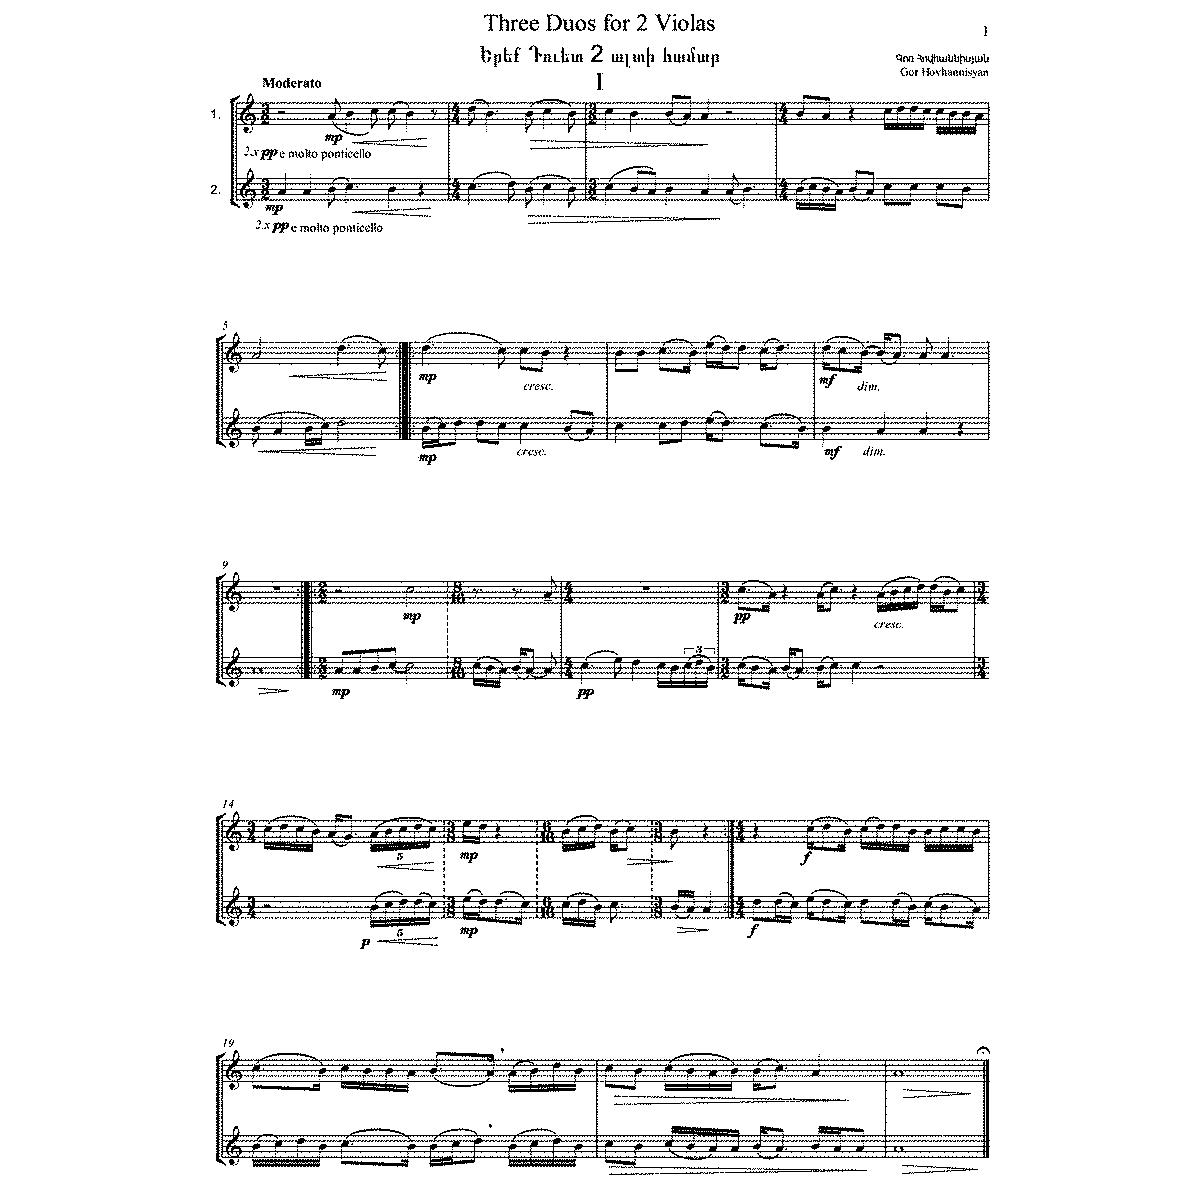 3 Duos for 2 Violas (Hovhannisyan, Gor) - IMSLP/Petrucci